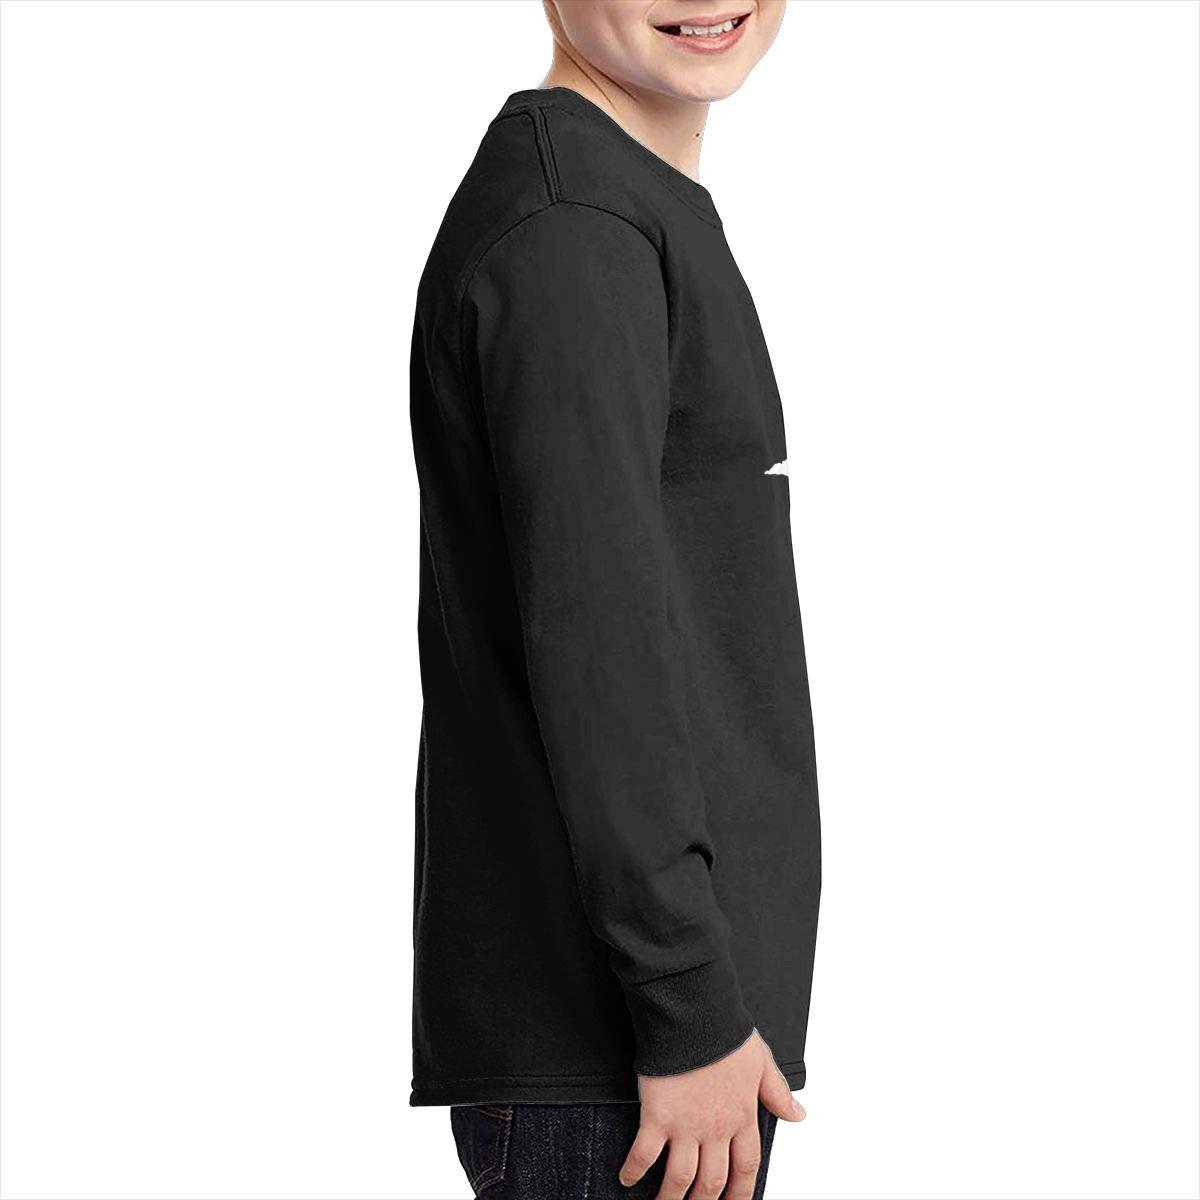 MichaelHazzard DevilDriver Logo Youth Breathable Long Sleeve Crewneck Tee T-Shirt for Boys and Girls